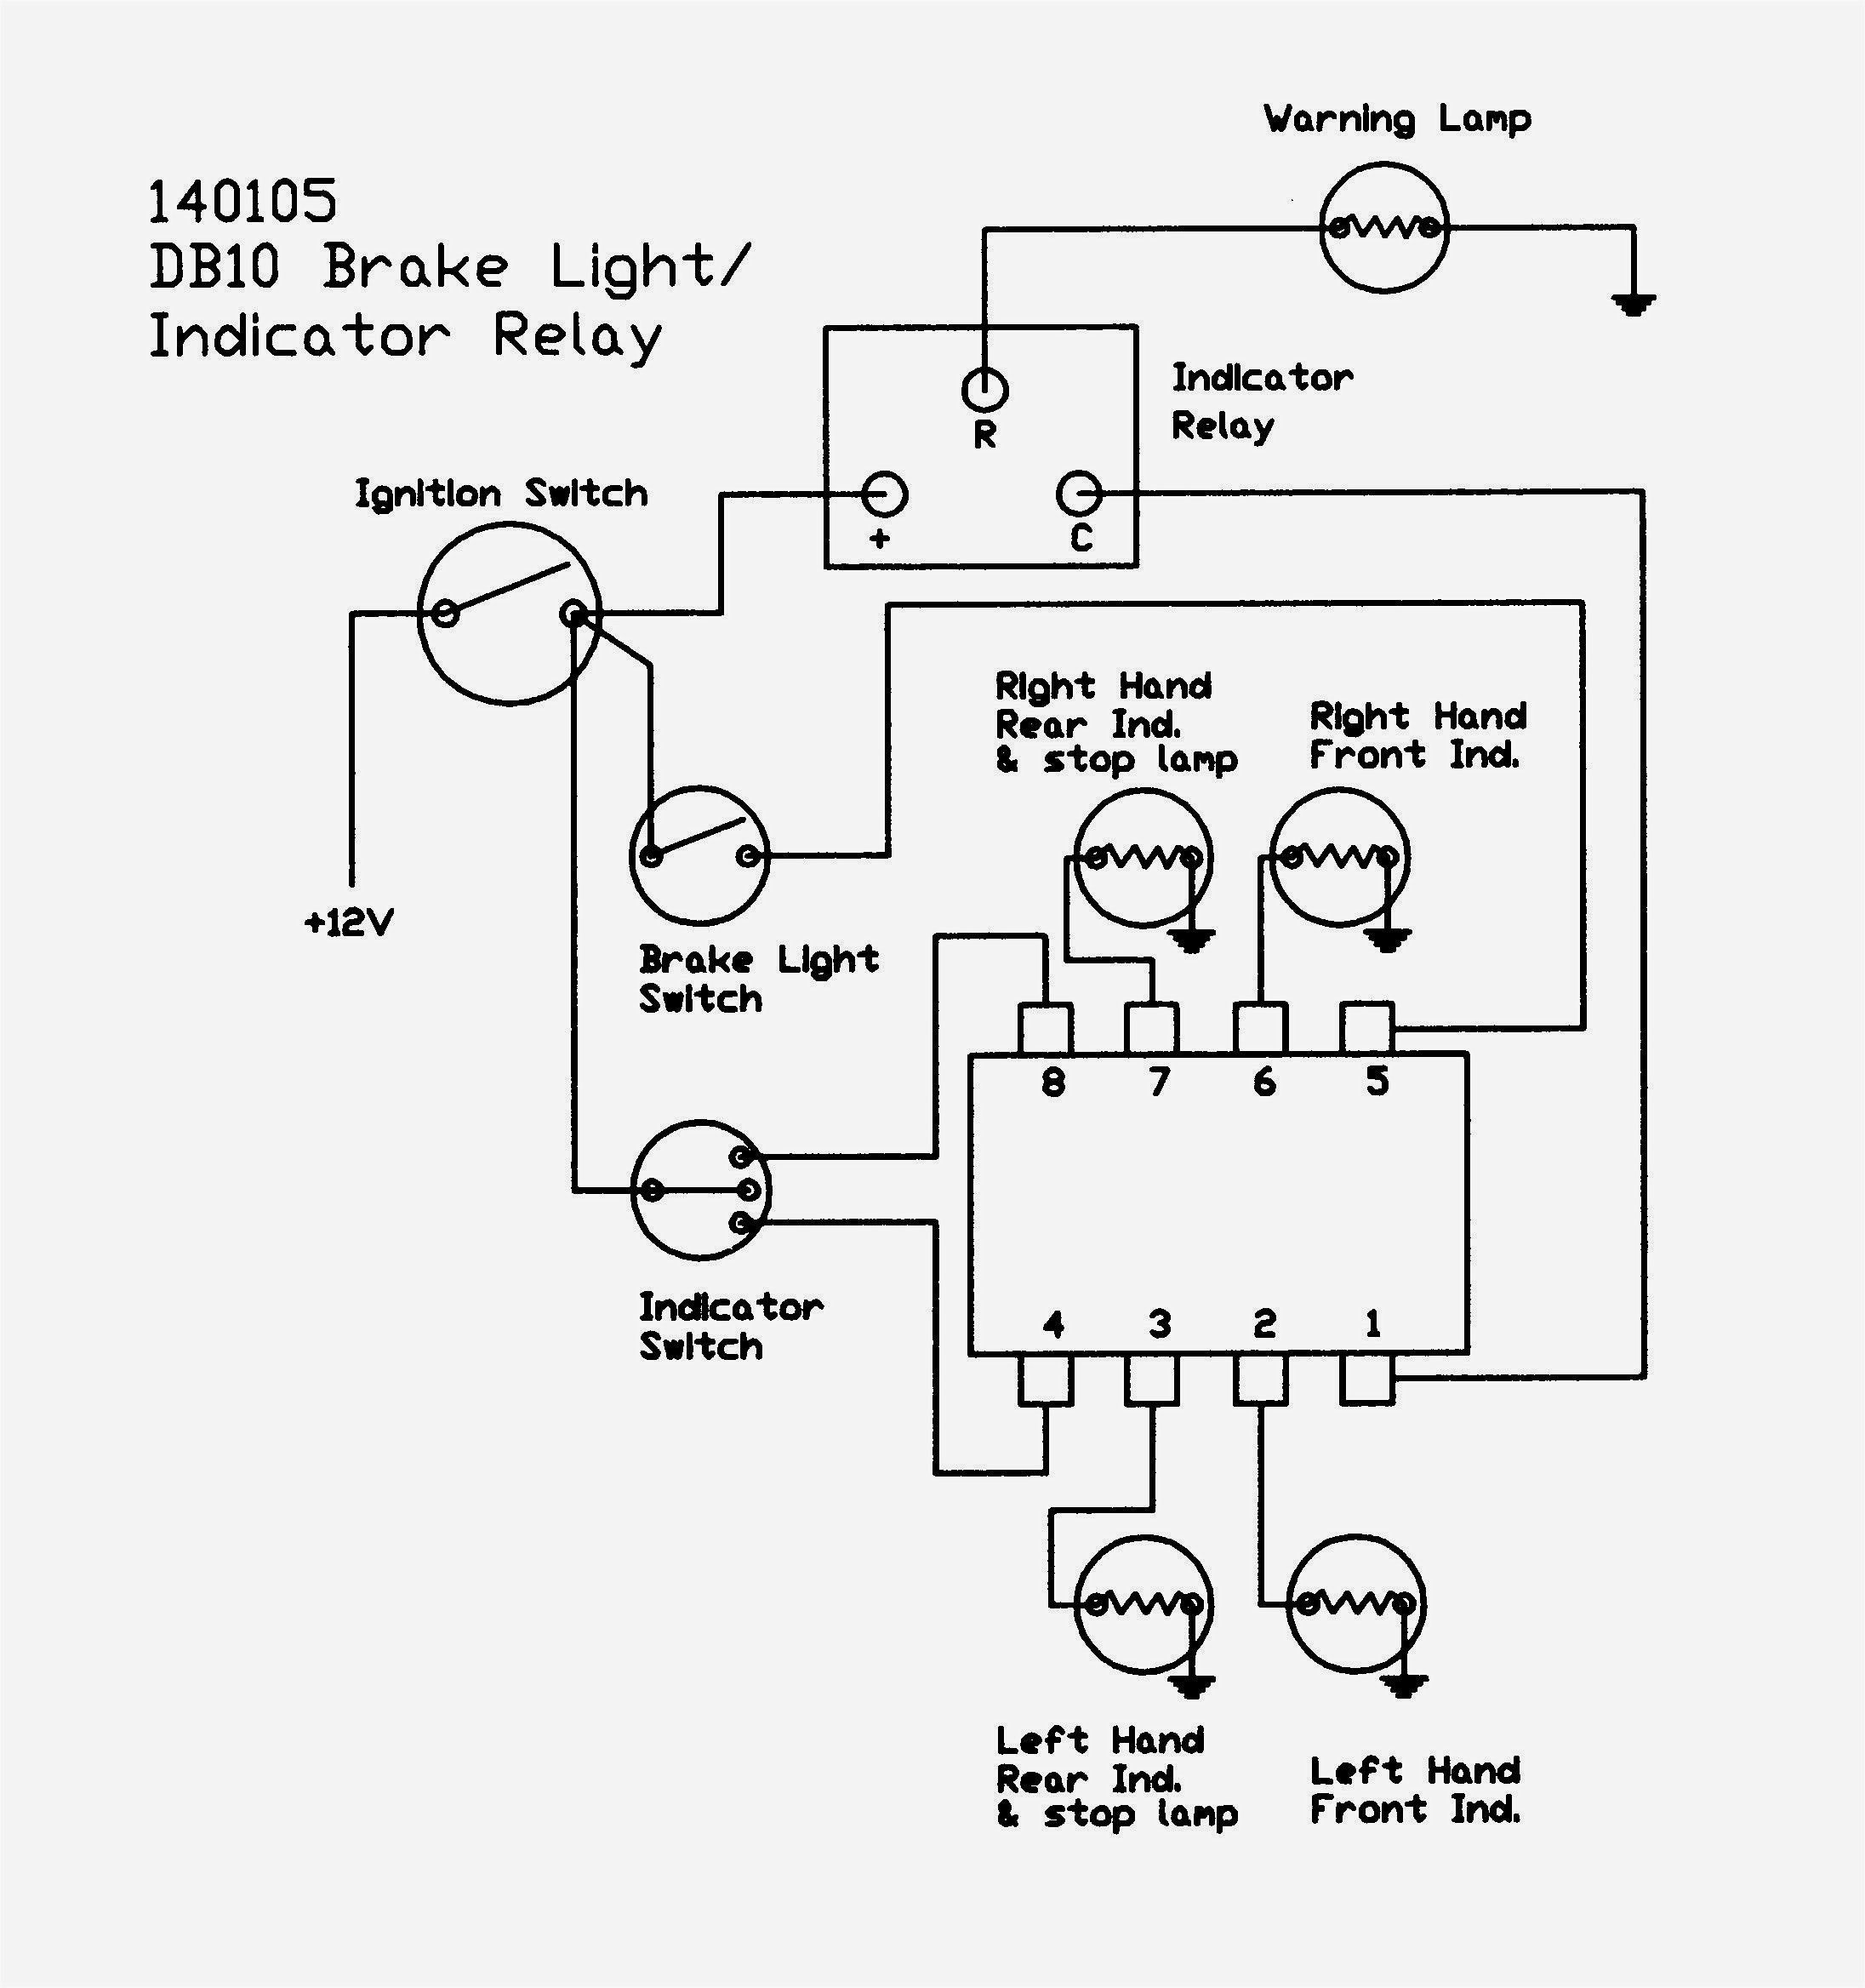 Elegant Light Switch Wiring Diagram Australia Hpm #diagrams #digramssample  #diagramimages #wiringdi… | Light switch wiring, Thermostat wiring,  Honeywell thermostatsPinterest